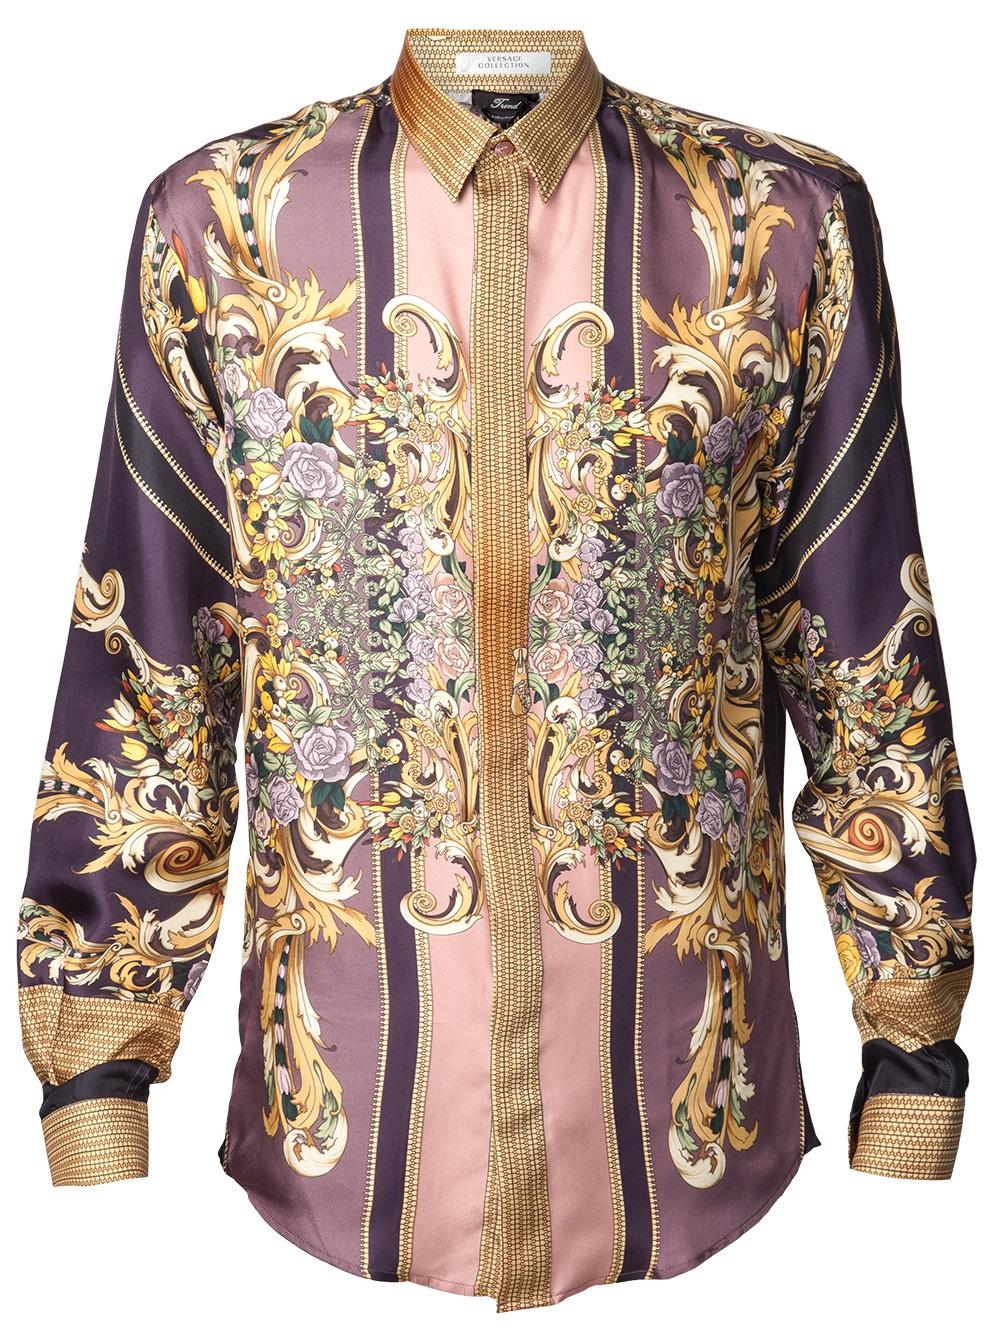 Shop online for Versace Men's Clothing, Shoes & Fragrance at autoebookj1.ga Find eau de toilette sets & shirts. Free Shipping. Free Returns. All the time.